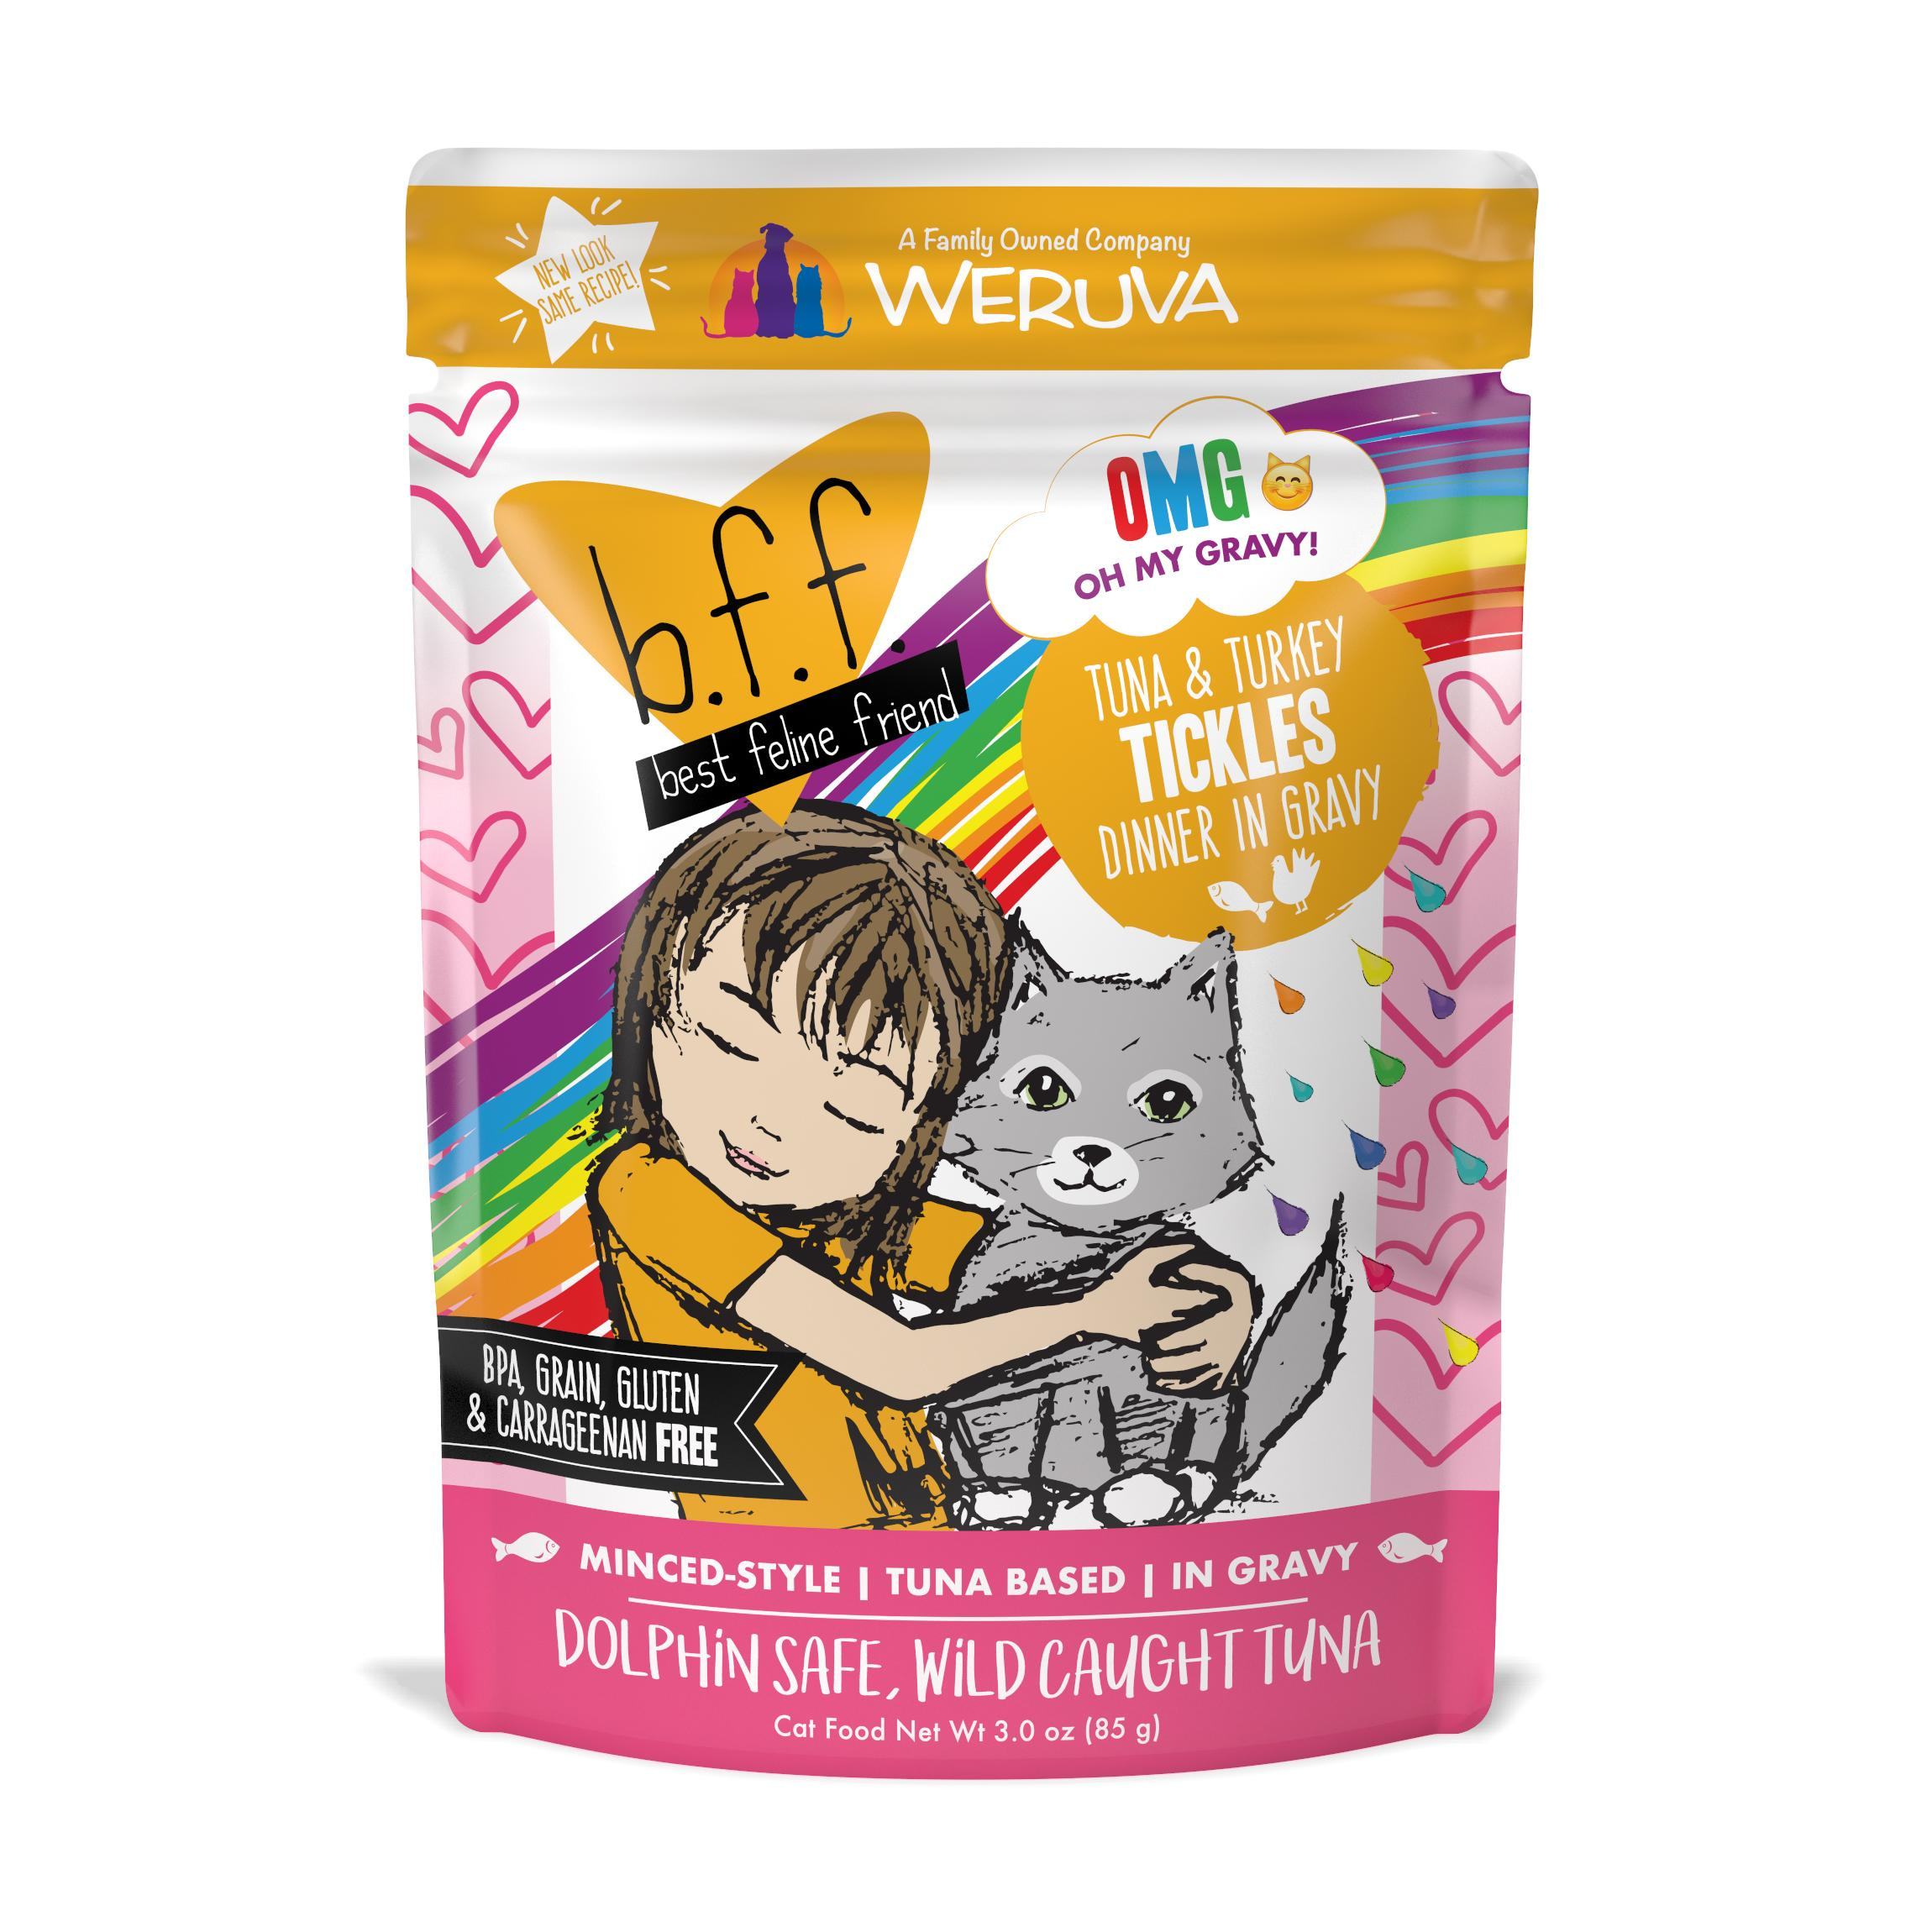 BFF Oh My Gravy! Tickles Tuna & Turkey Dinner in Gravy Grain-Free Wet Cat Food Image